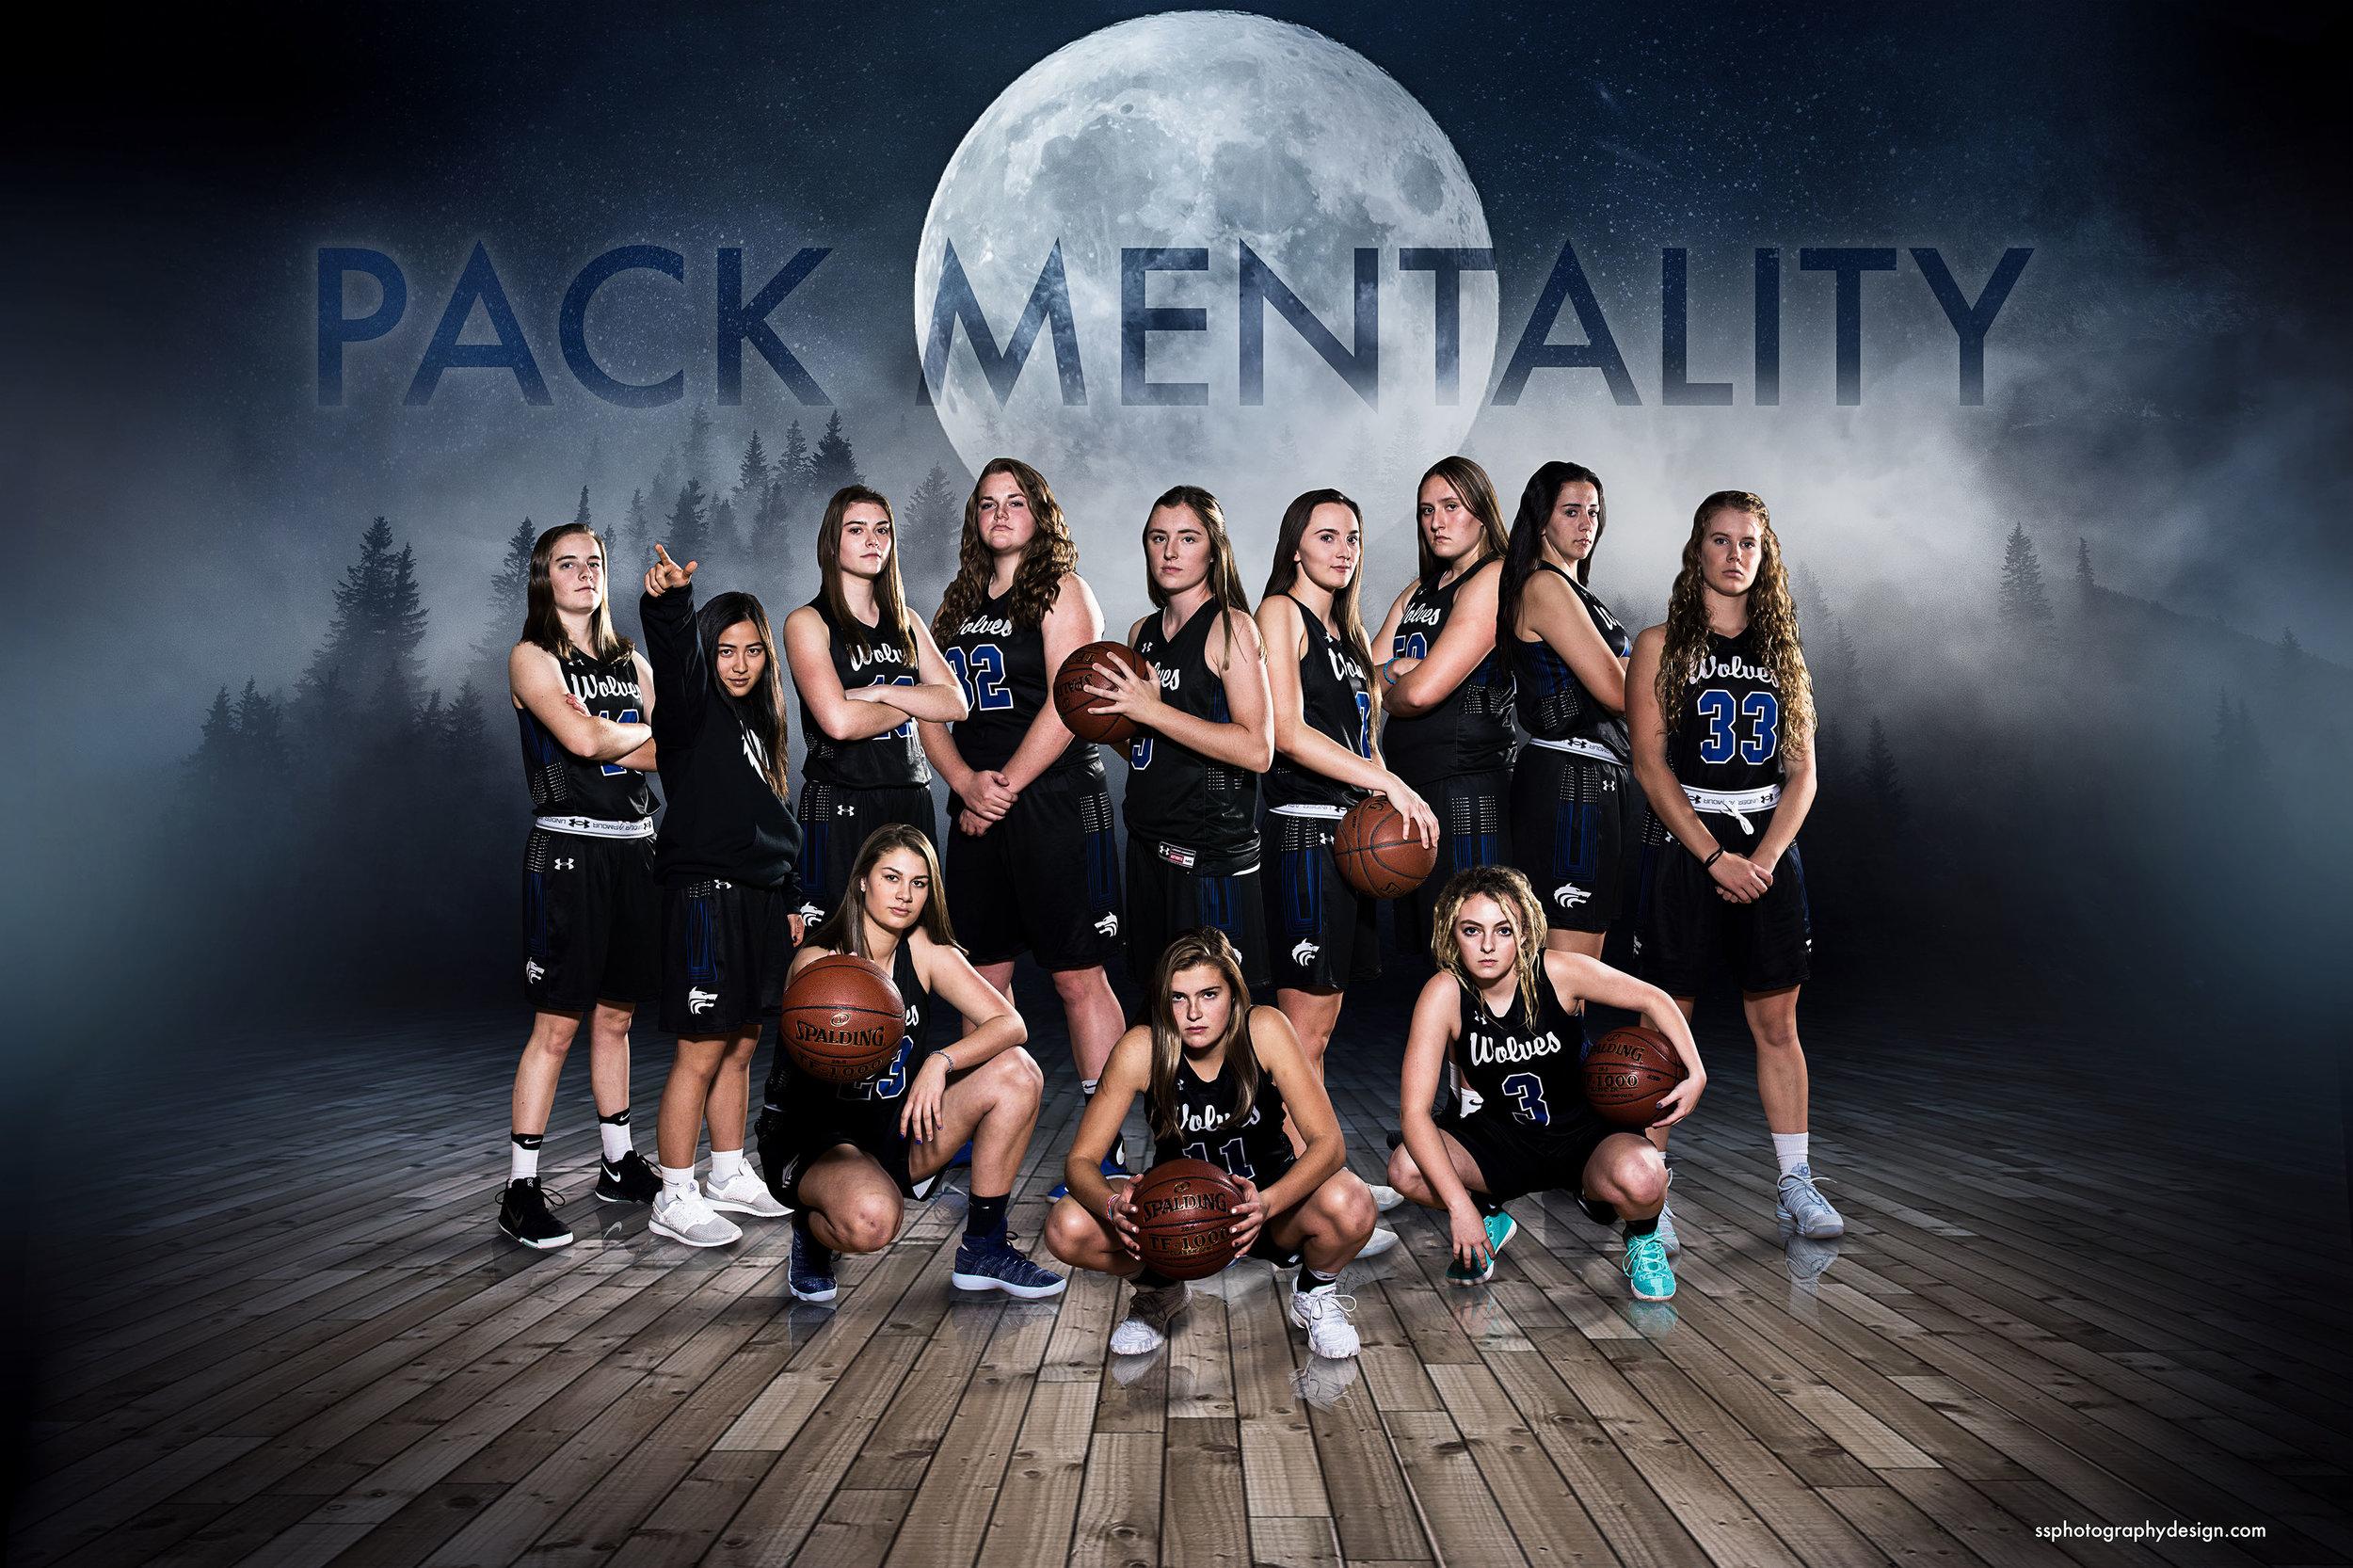 Timberline High School Girls Basketball Team photography, lighting, and composite.